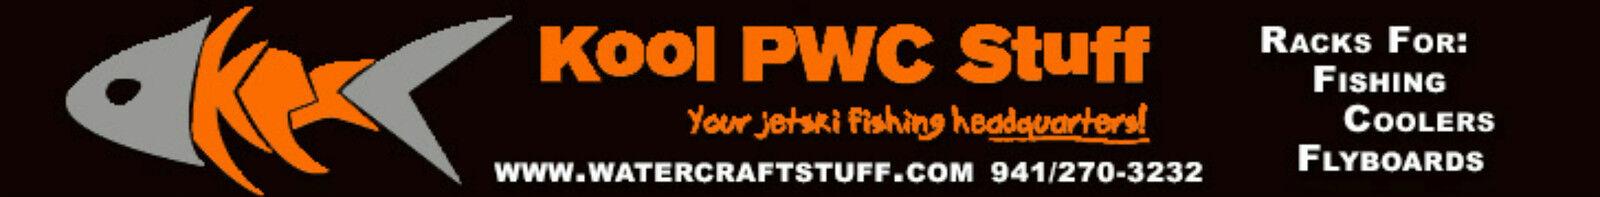 Kool+PWC+Stuff